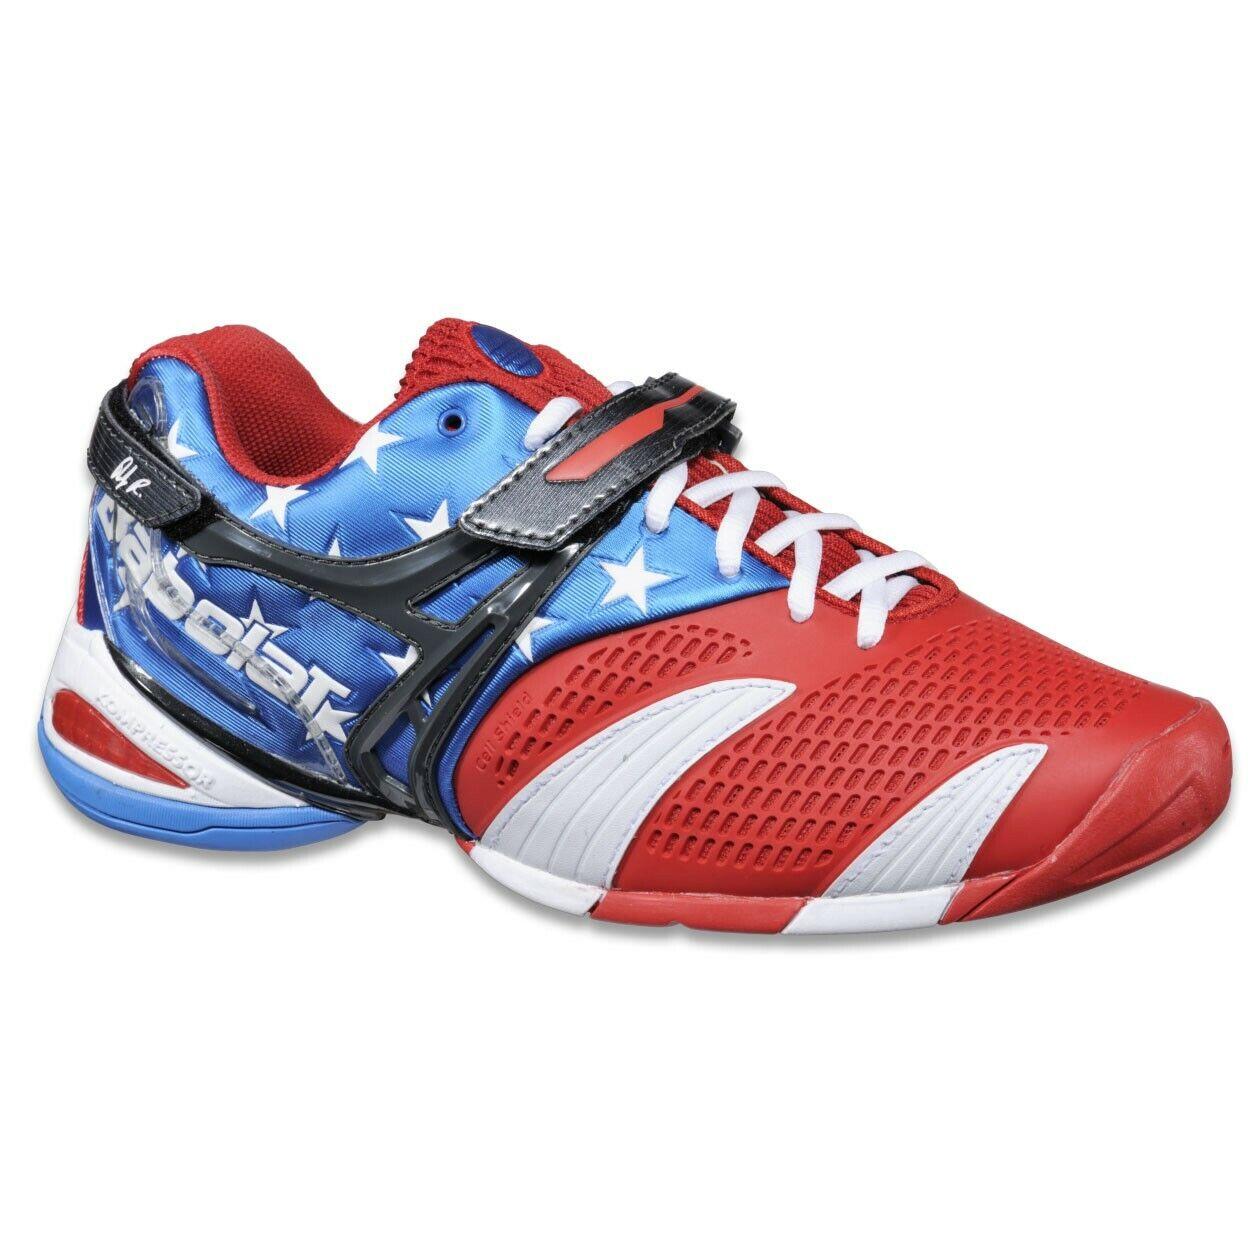 NEU BABOLAT Propulse All Court Stars+Stripes Limited Edition Edition Edition Tennisschuhe SALE    | Louis, ausführlich  | Überlegen  | Sehr gute Farbe  276d6c